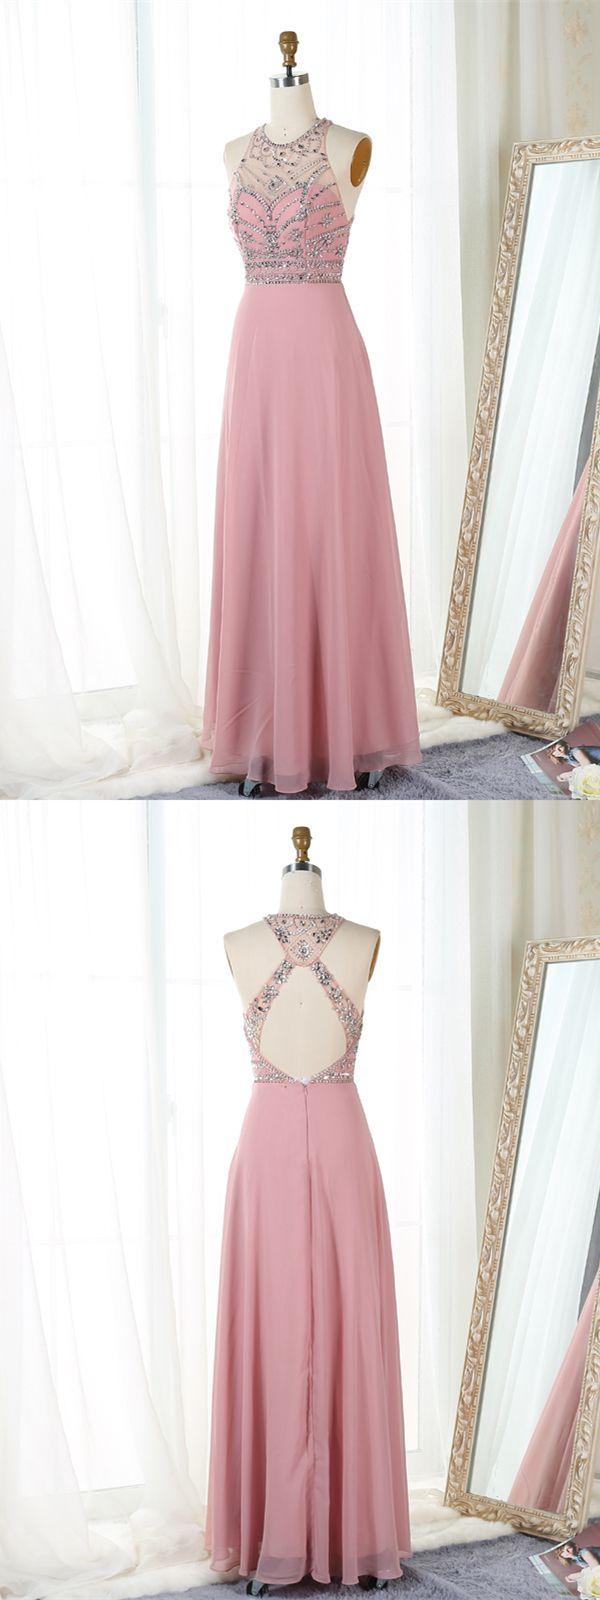 A-Line Jewel Open Back Floor-Length Blush Prom Dress   Pinterest ...